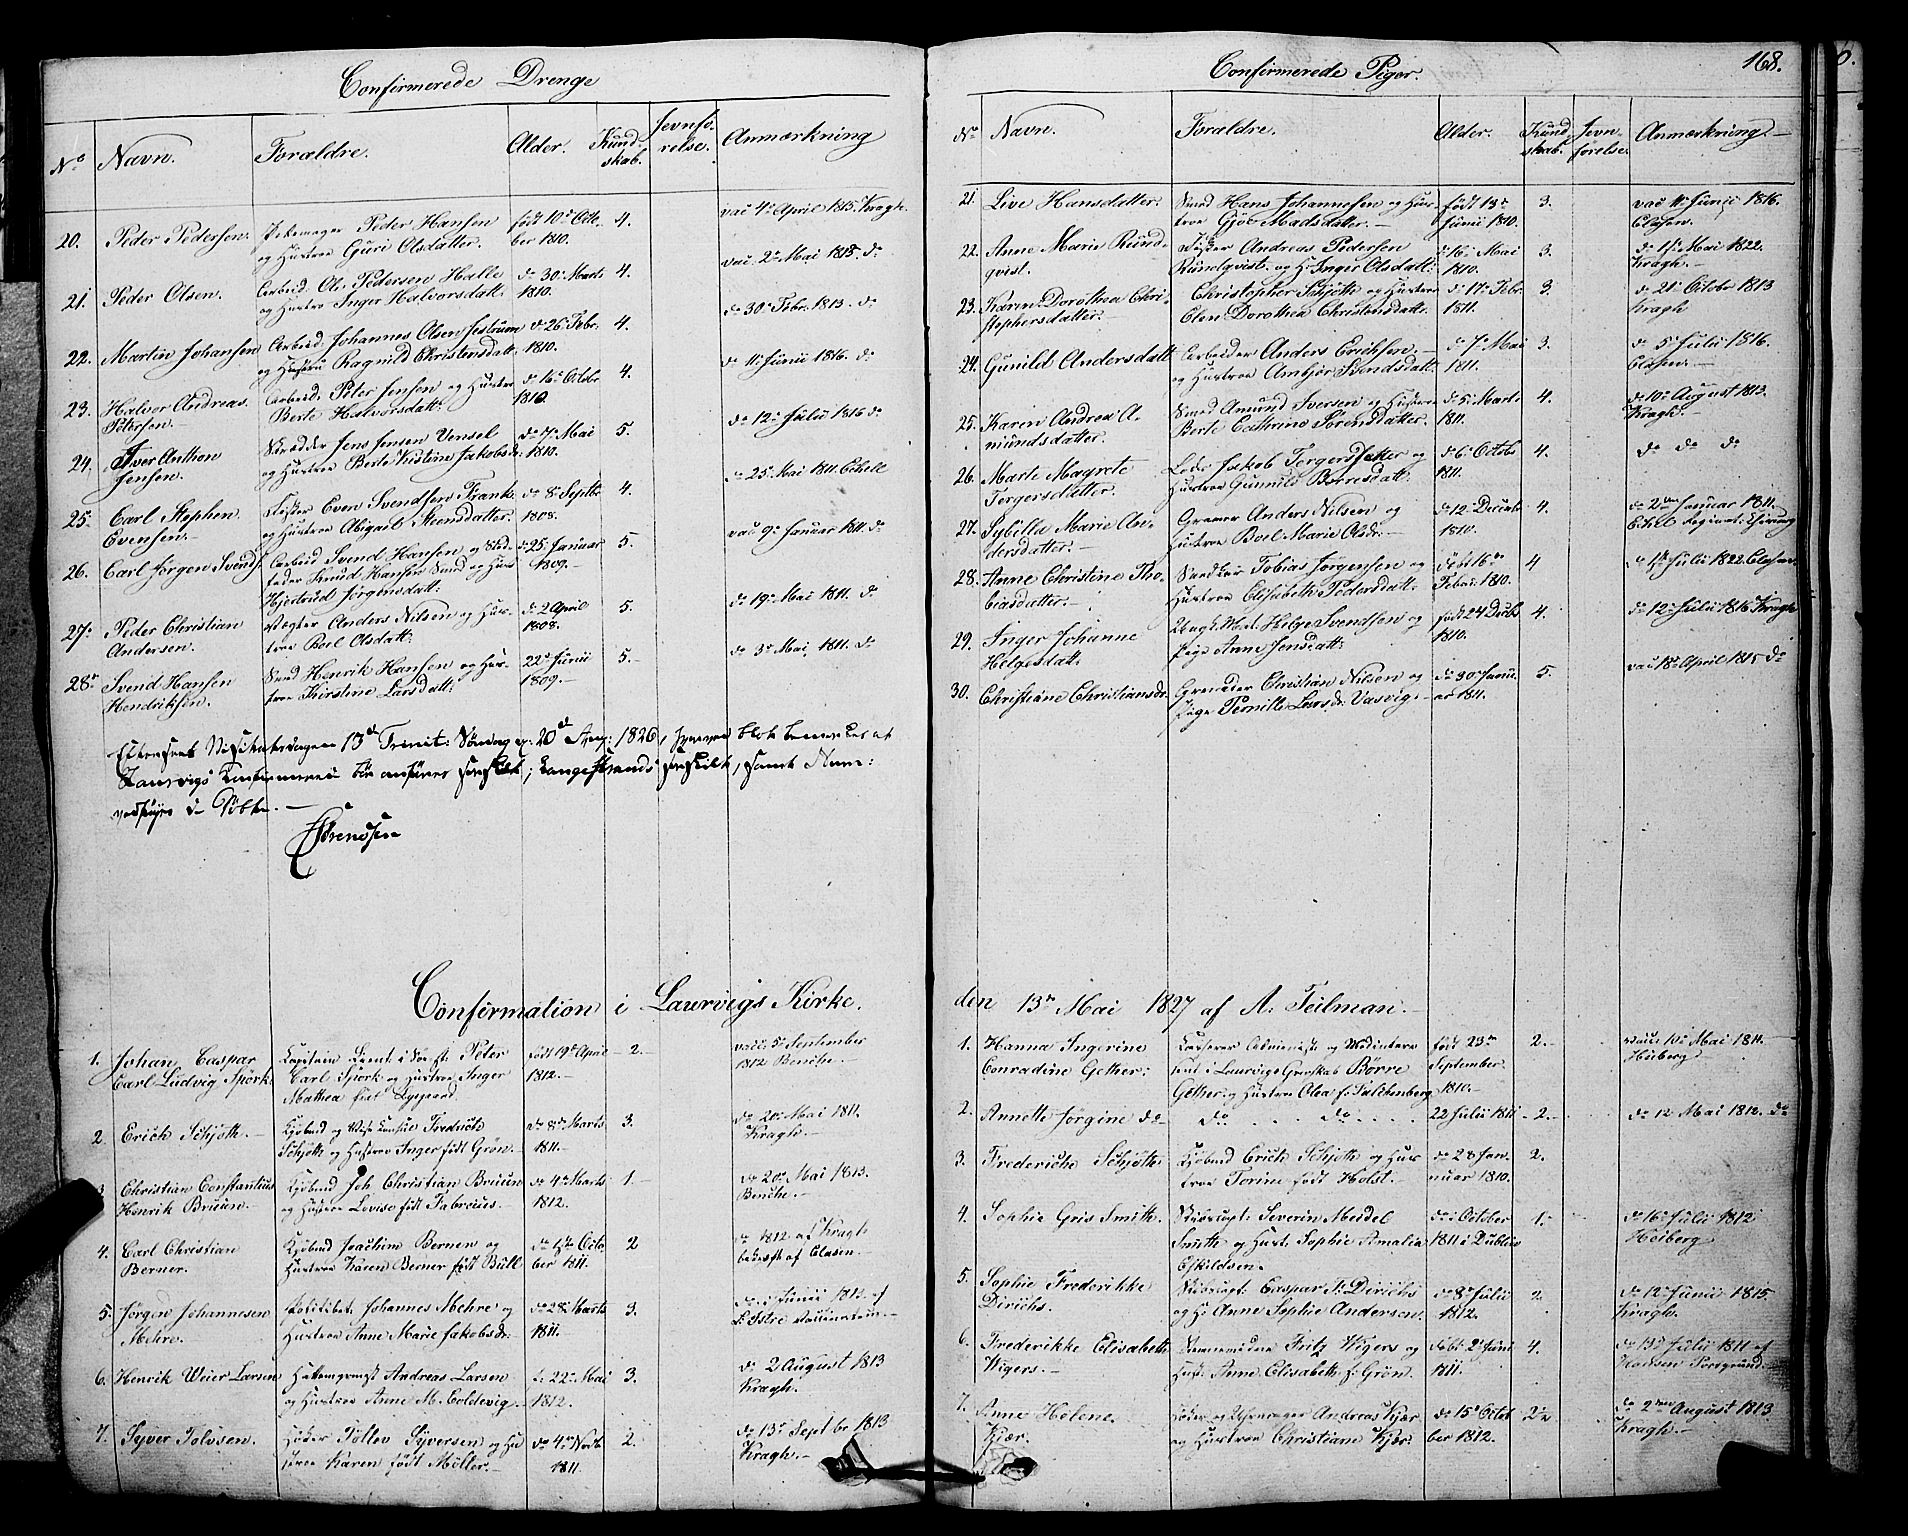 SAKO, Larvik kirkebøker, F/Fa/L0002: Ministerialbok nr. I 2, 1825-1847, s. 168